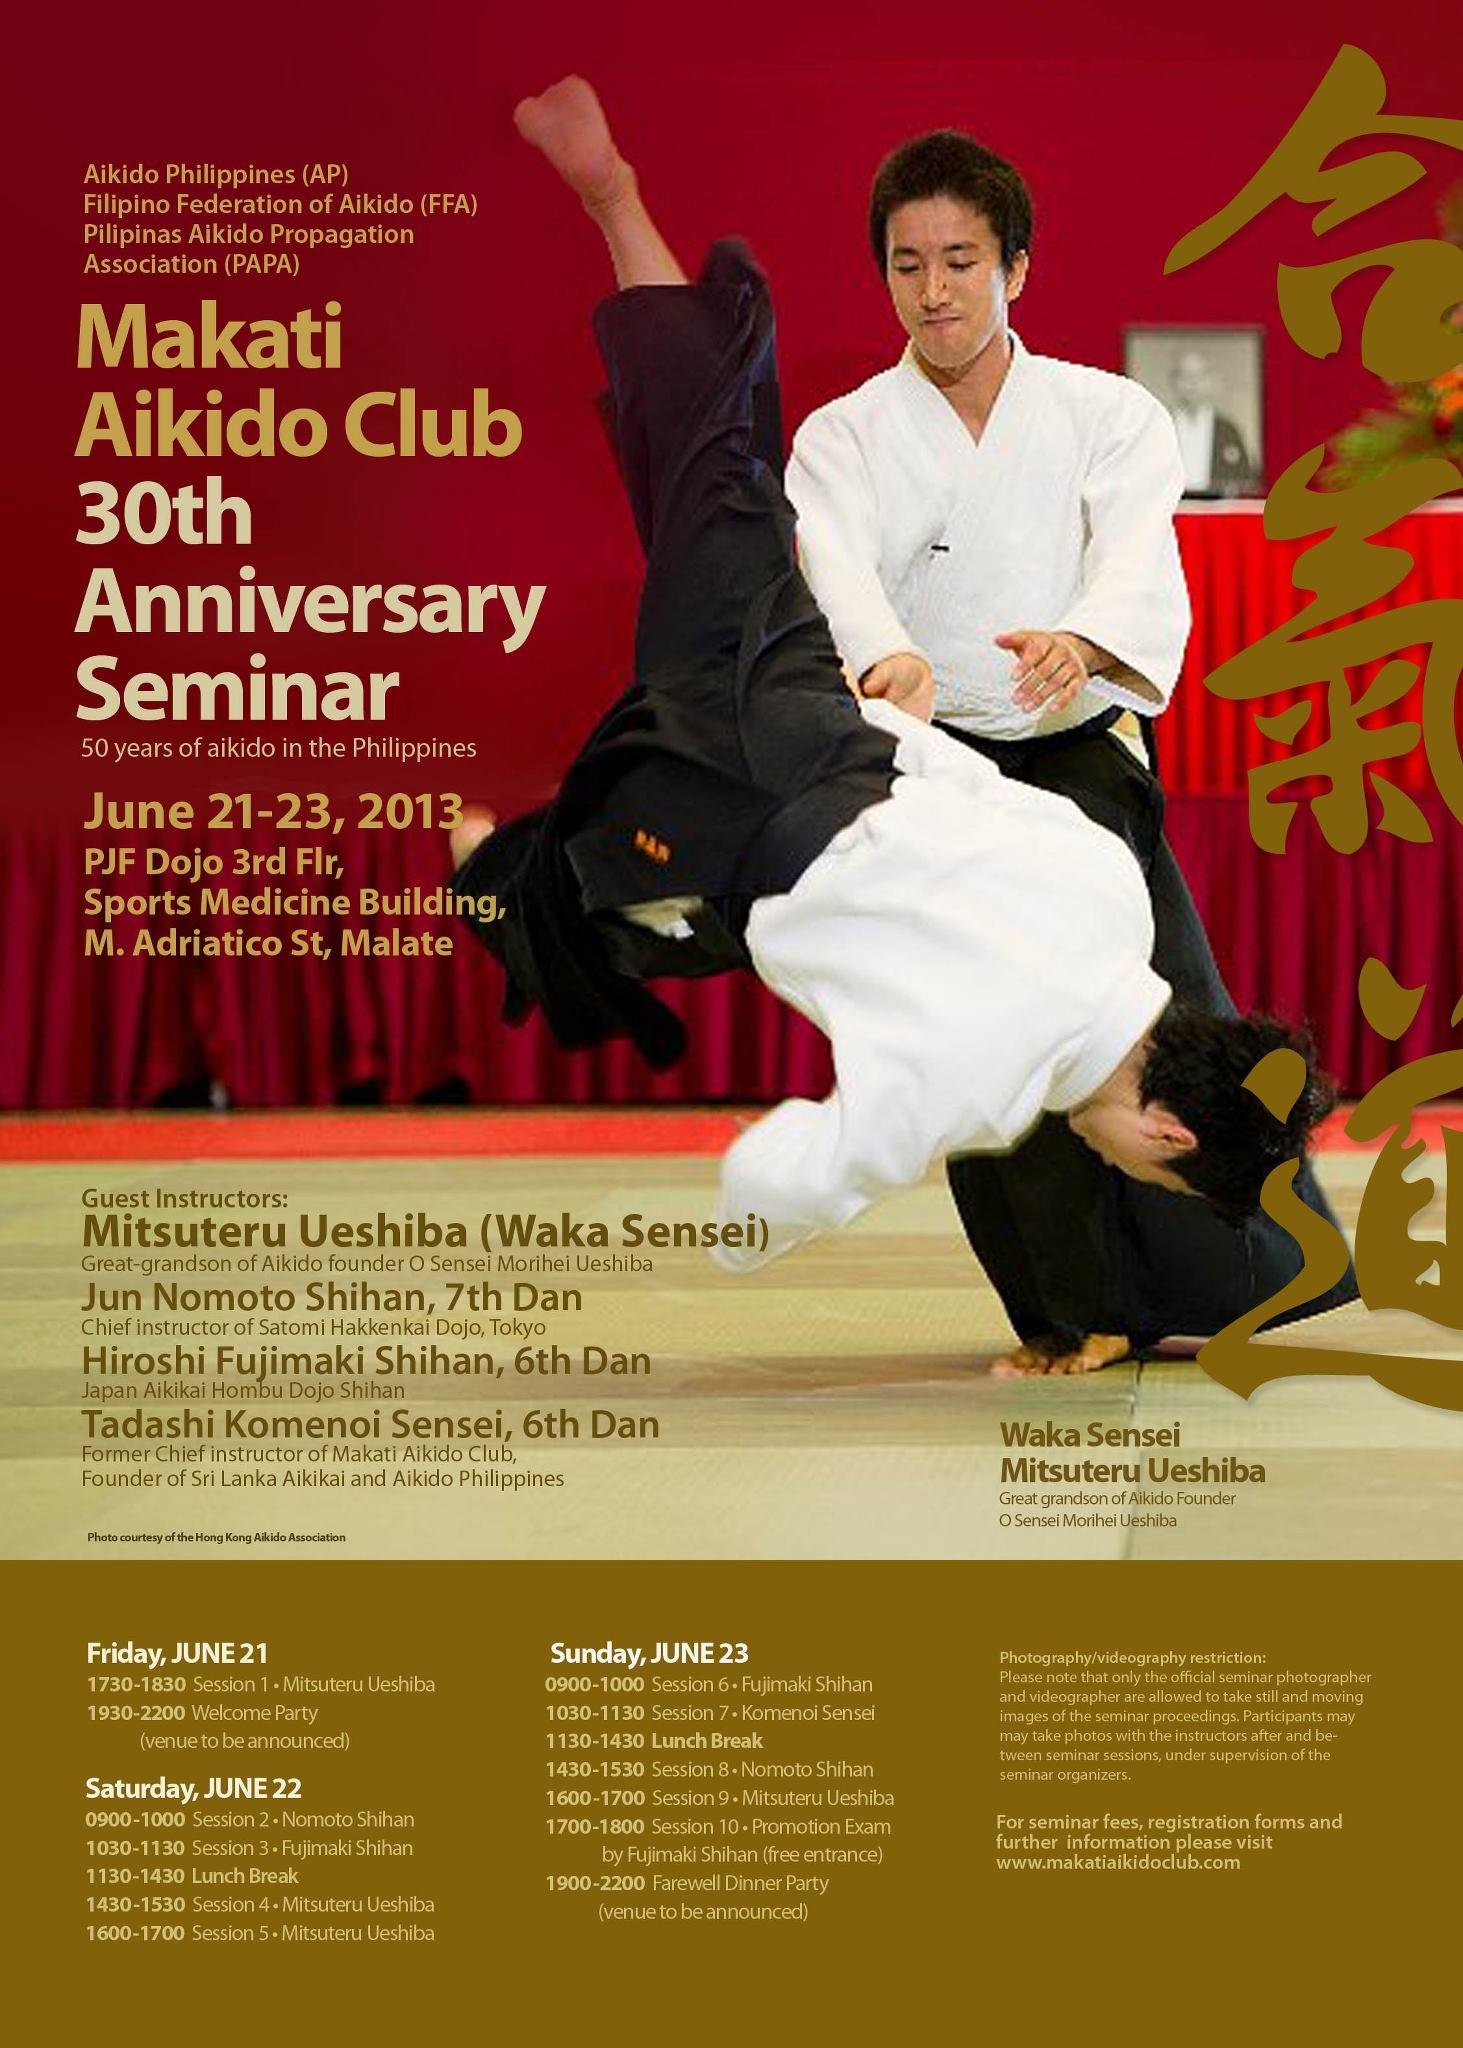 Makati Aikido Club 30th Anniversary Seminar